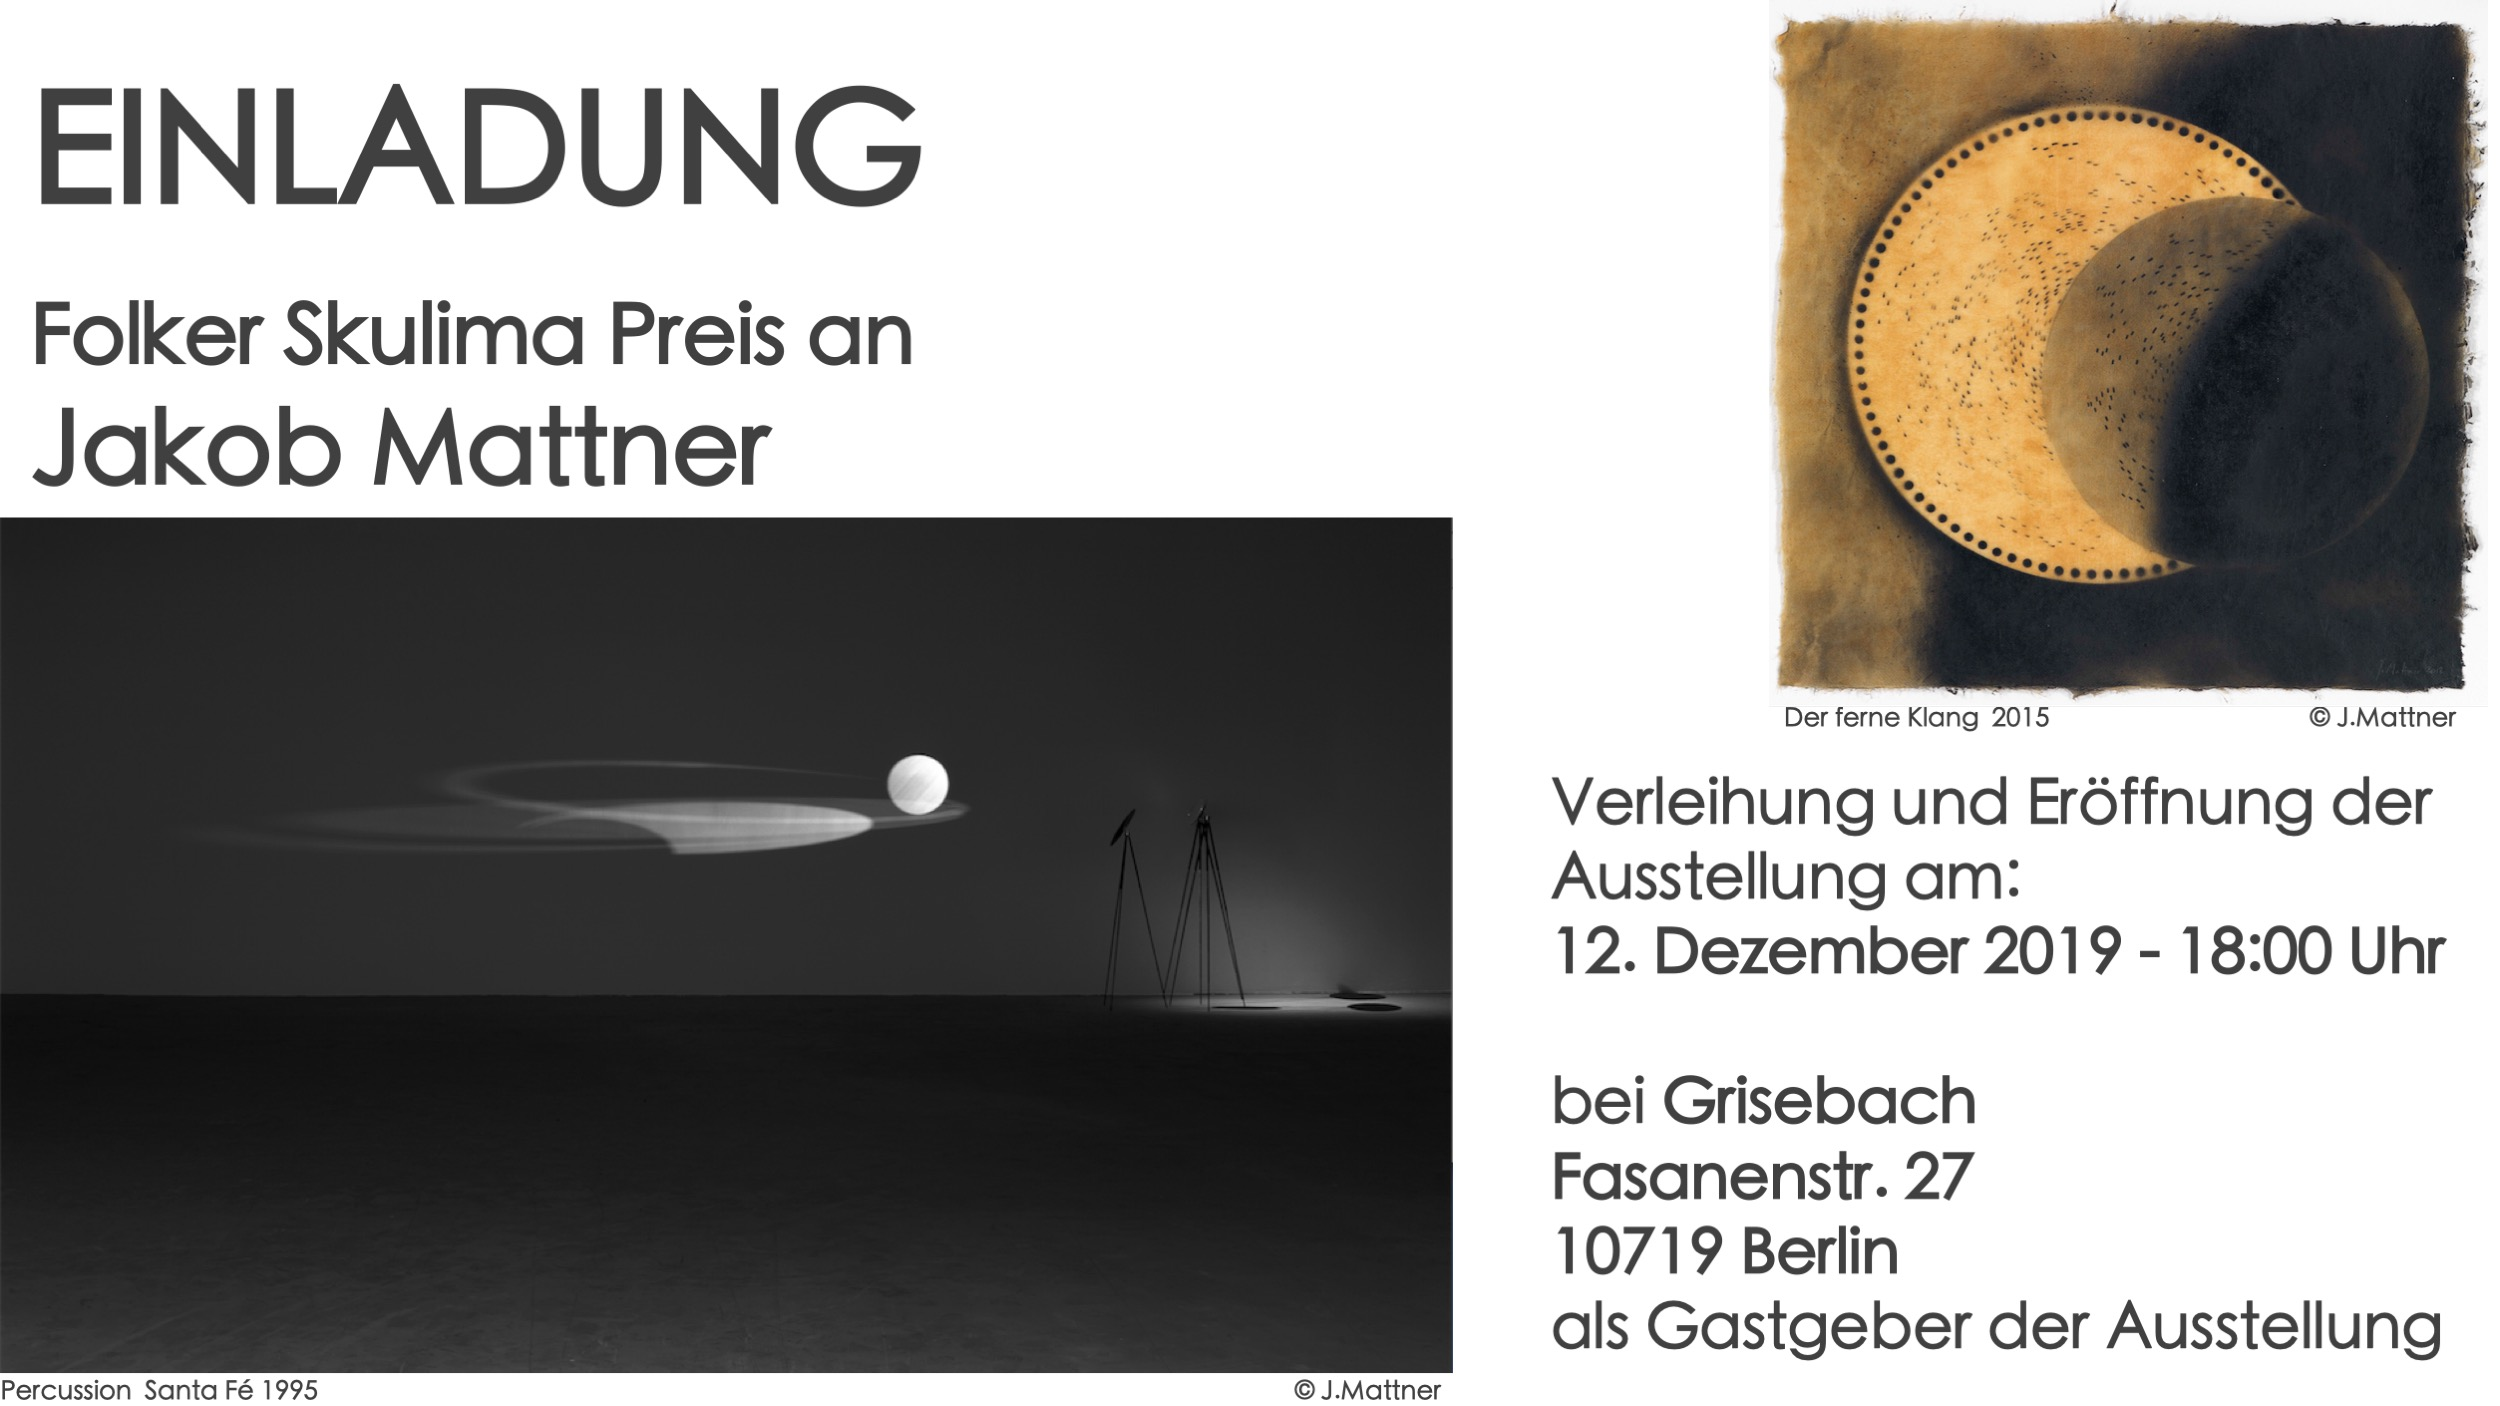 Einladungskarte zur Folker Skulima Preisverleihung an Jakob Mattner